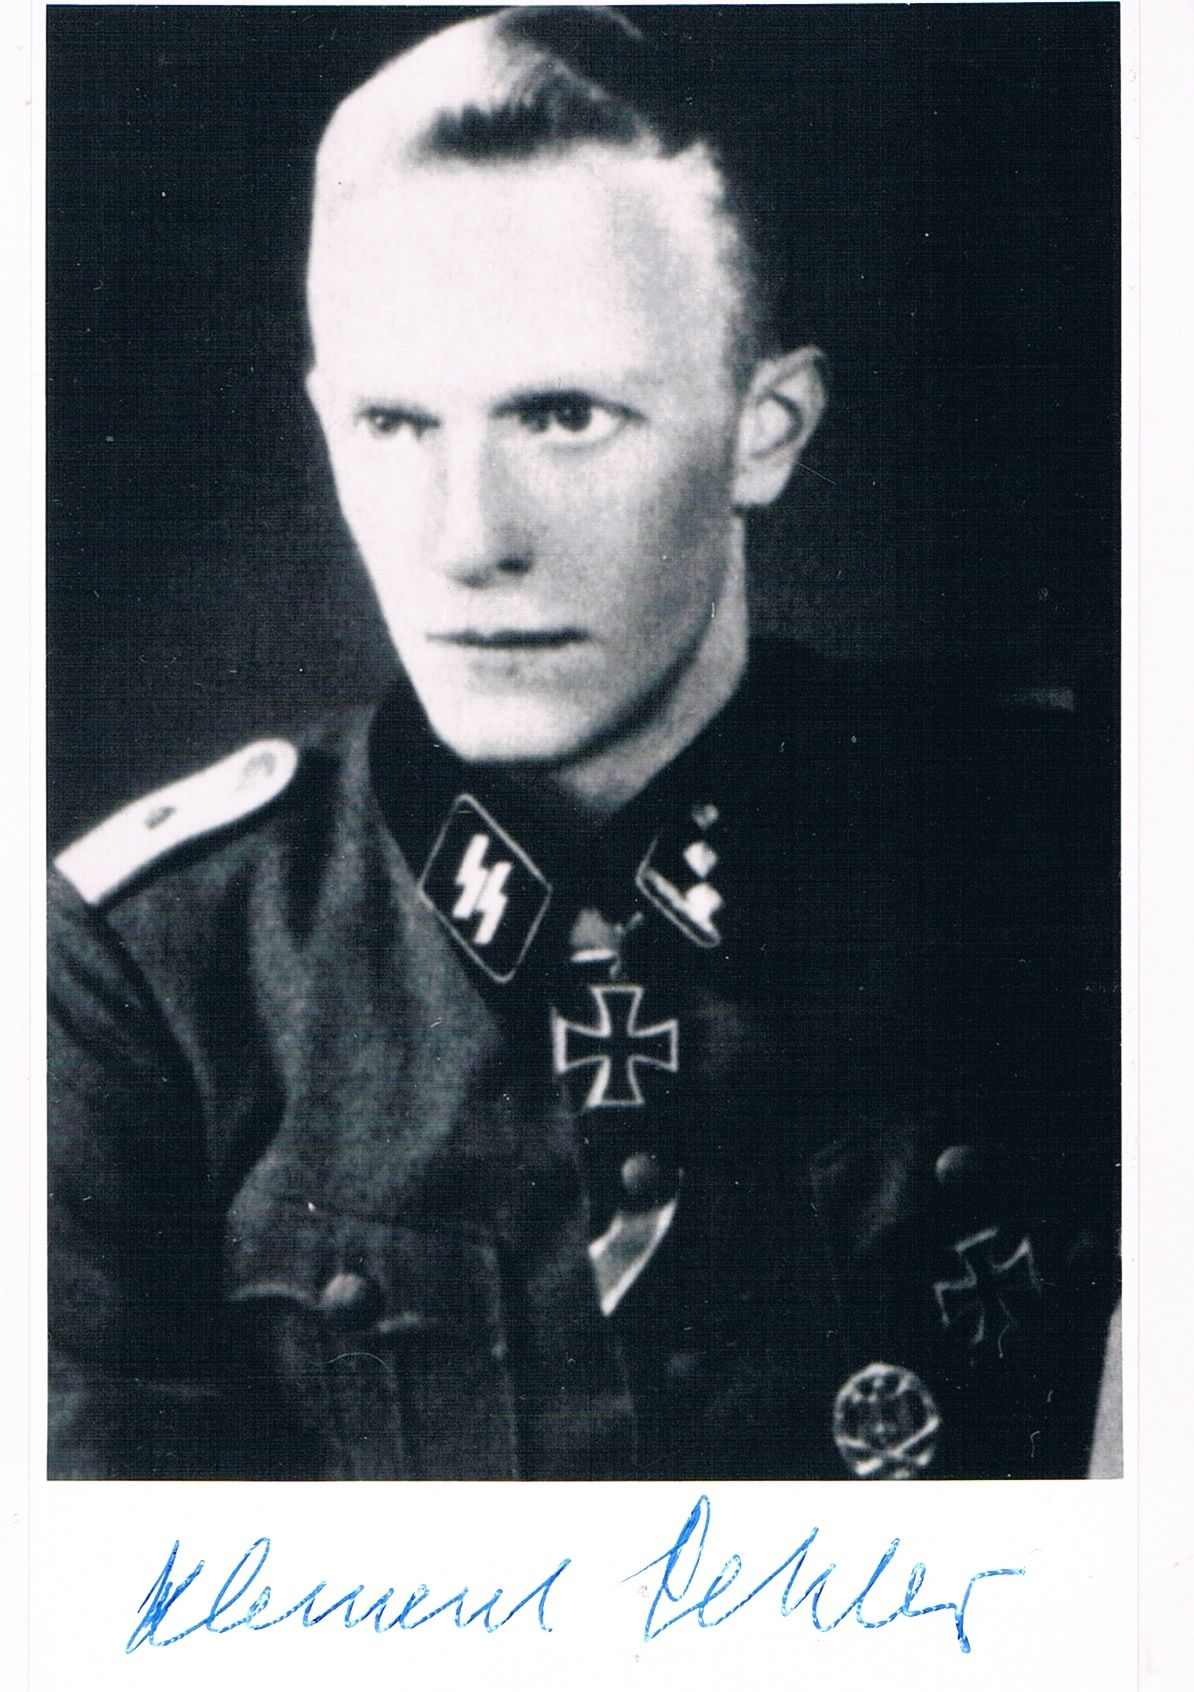 Klemens Behler